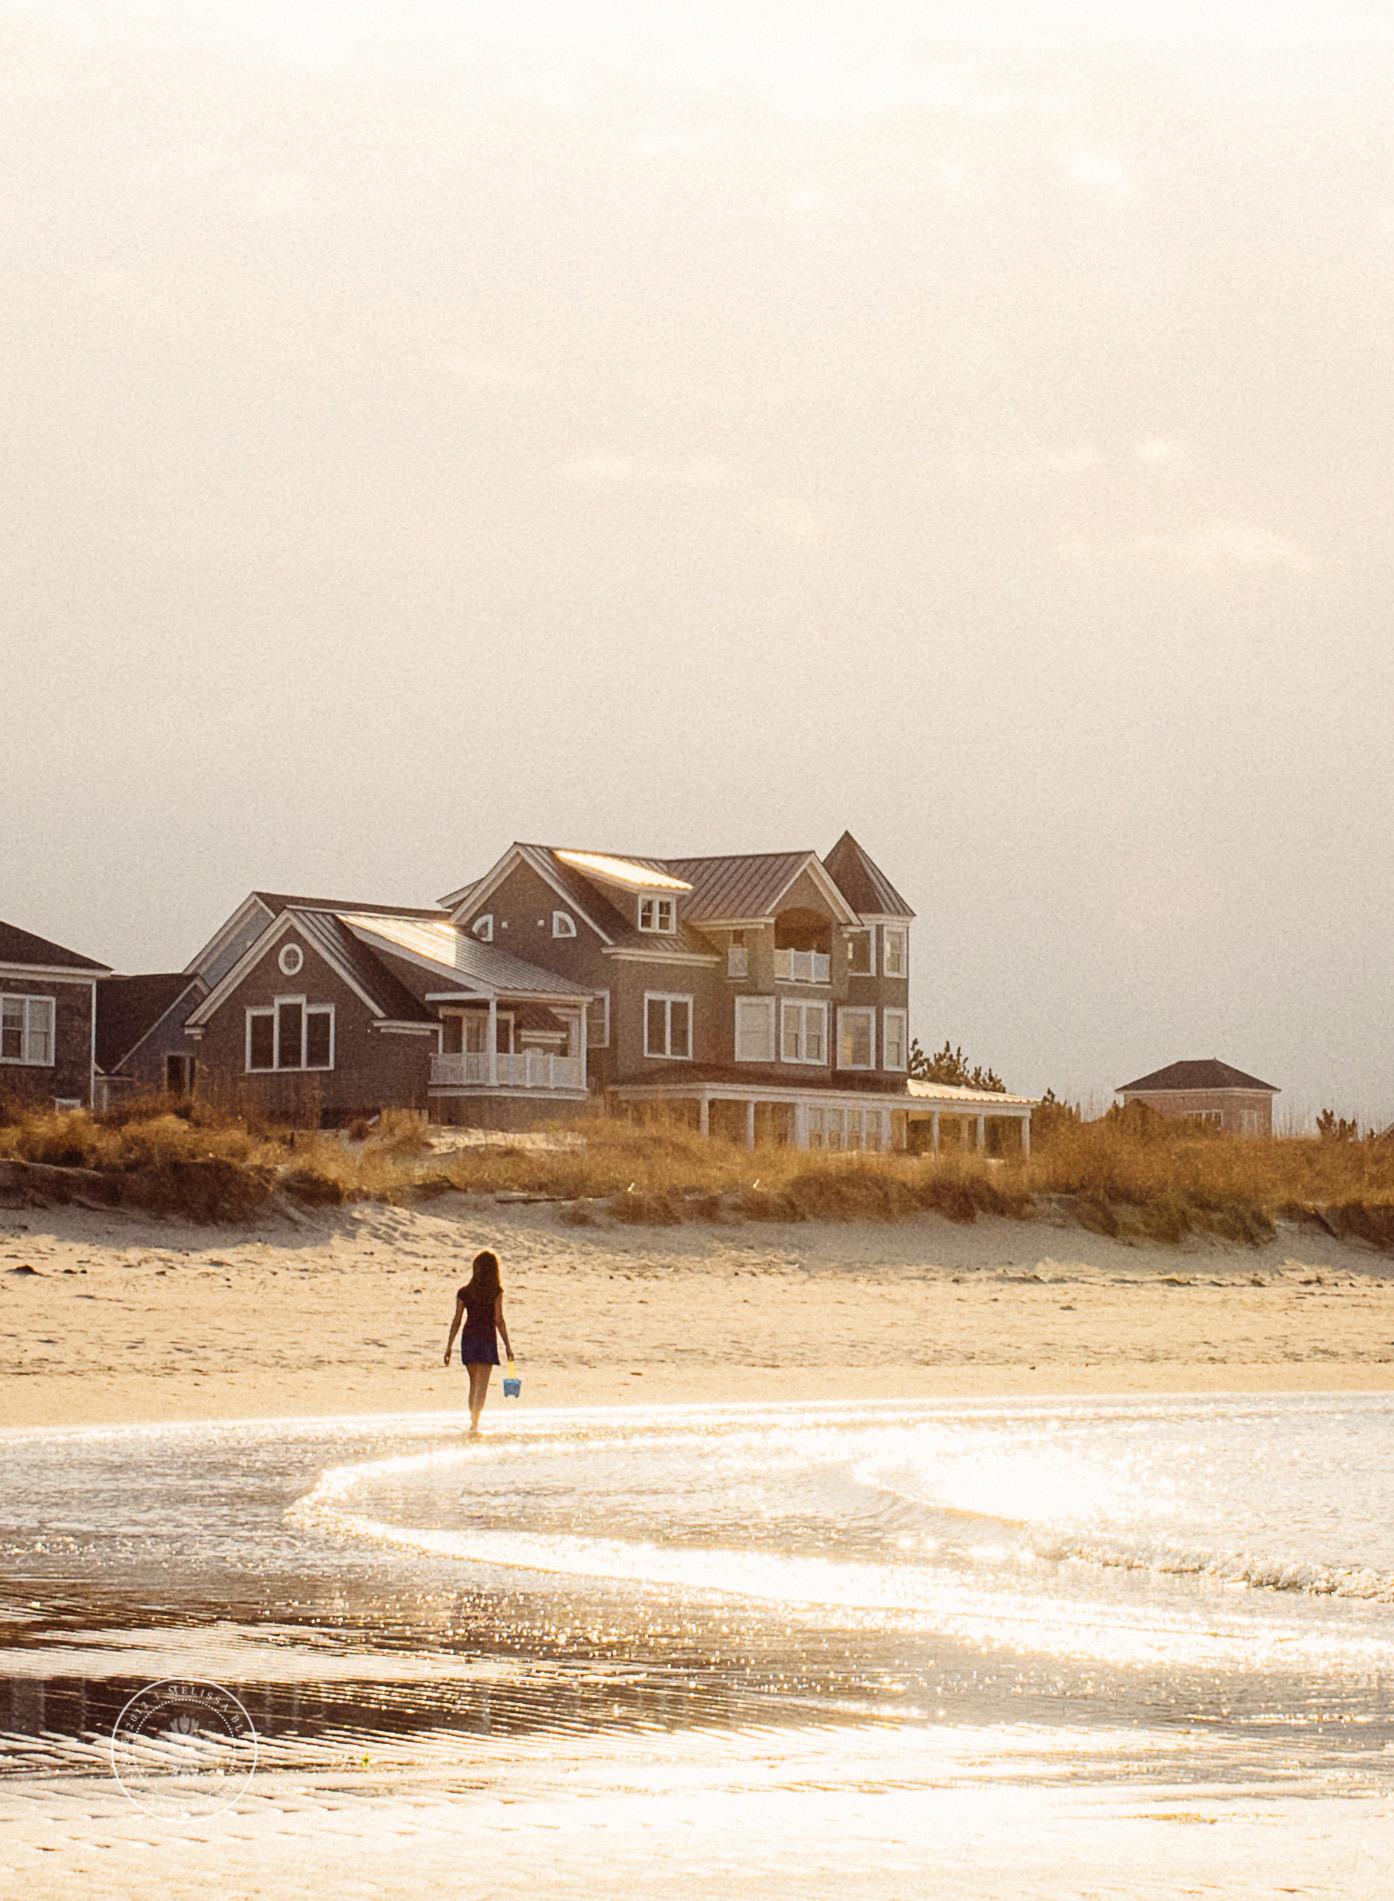 norfolk-photographers-sunshine-teen-walking-on-the-beach.jpg